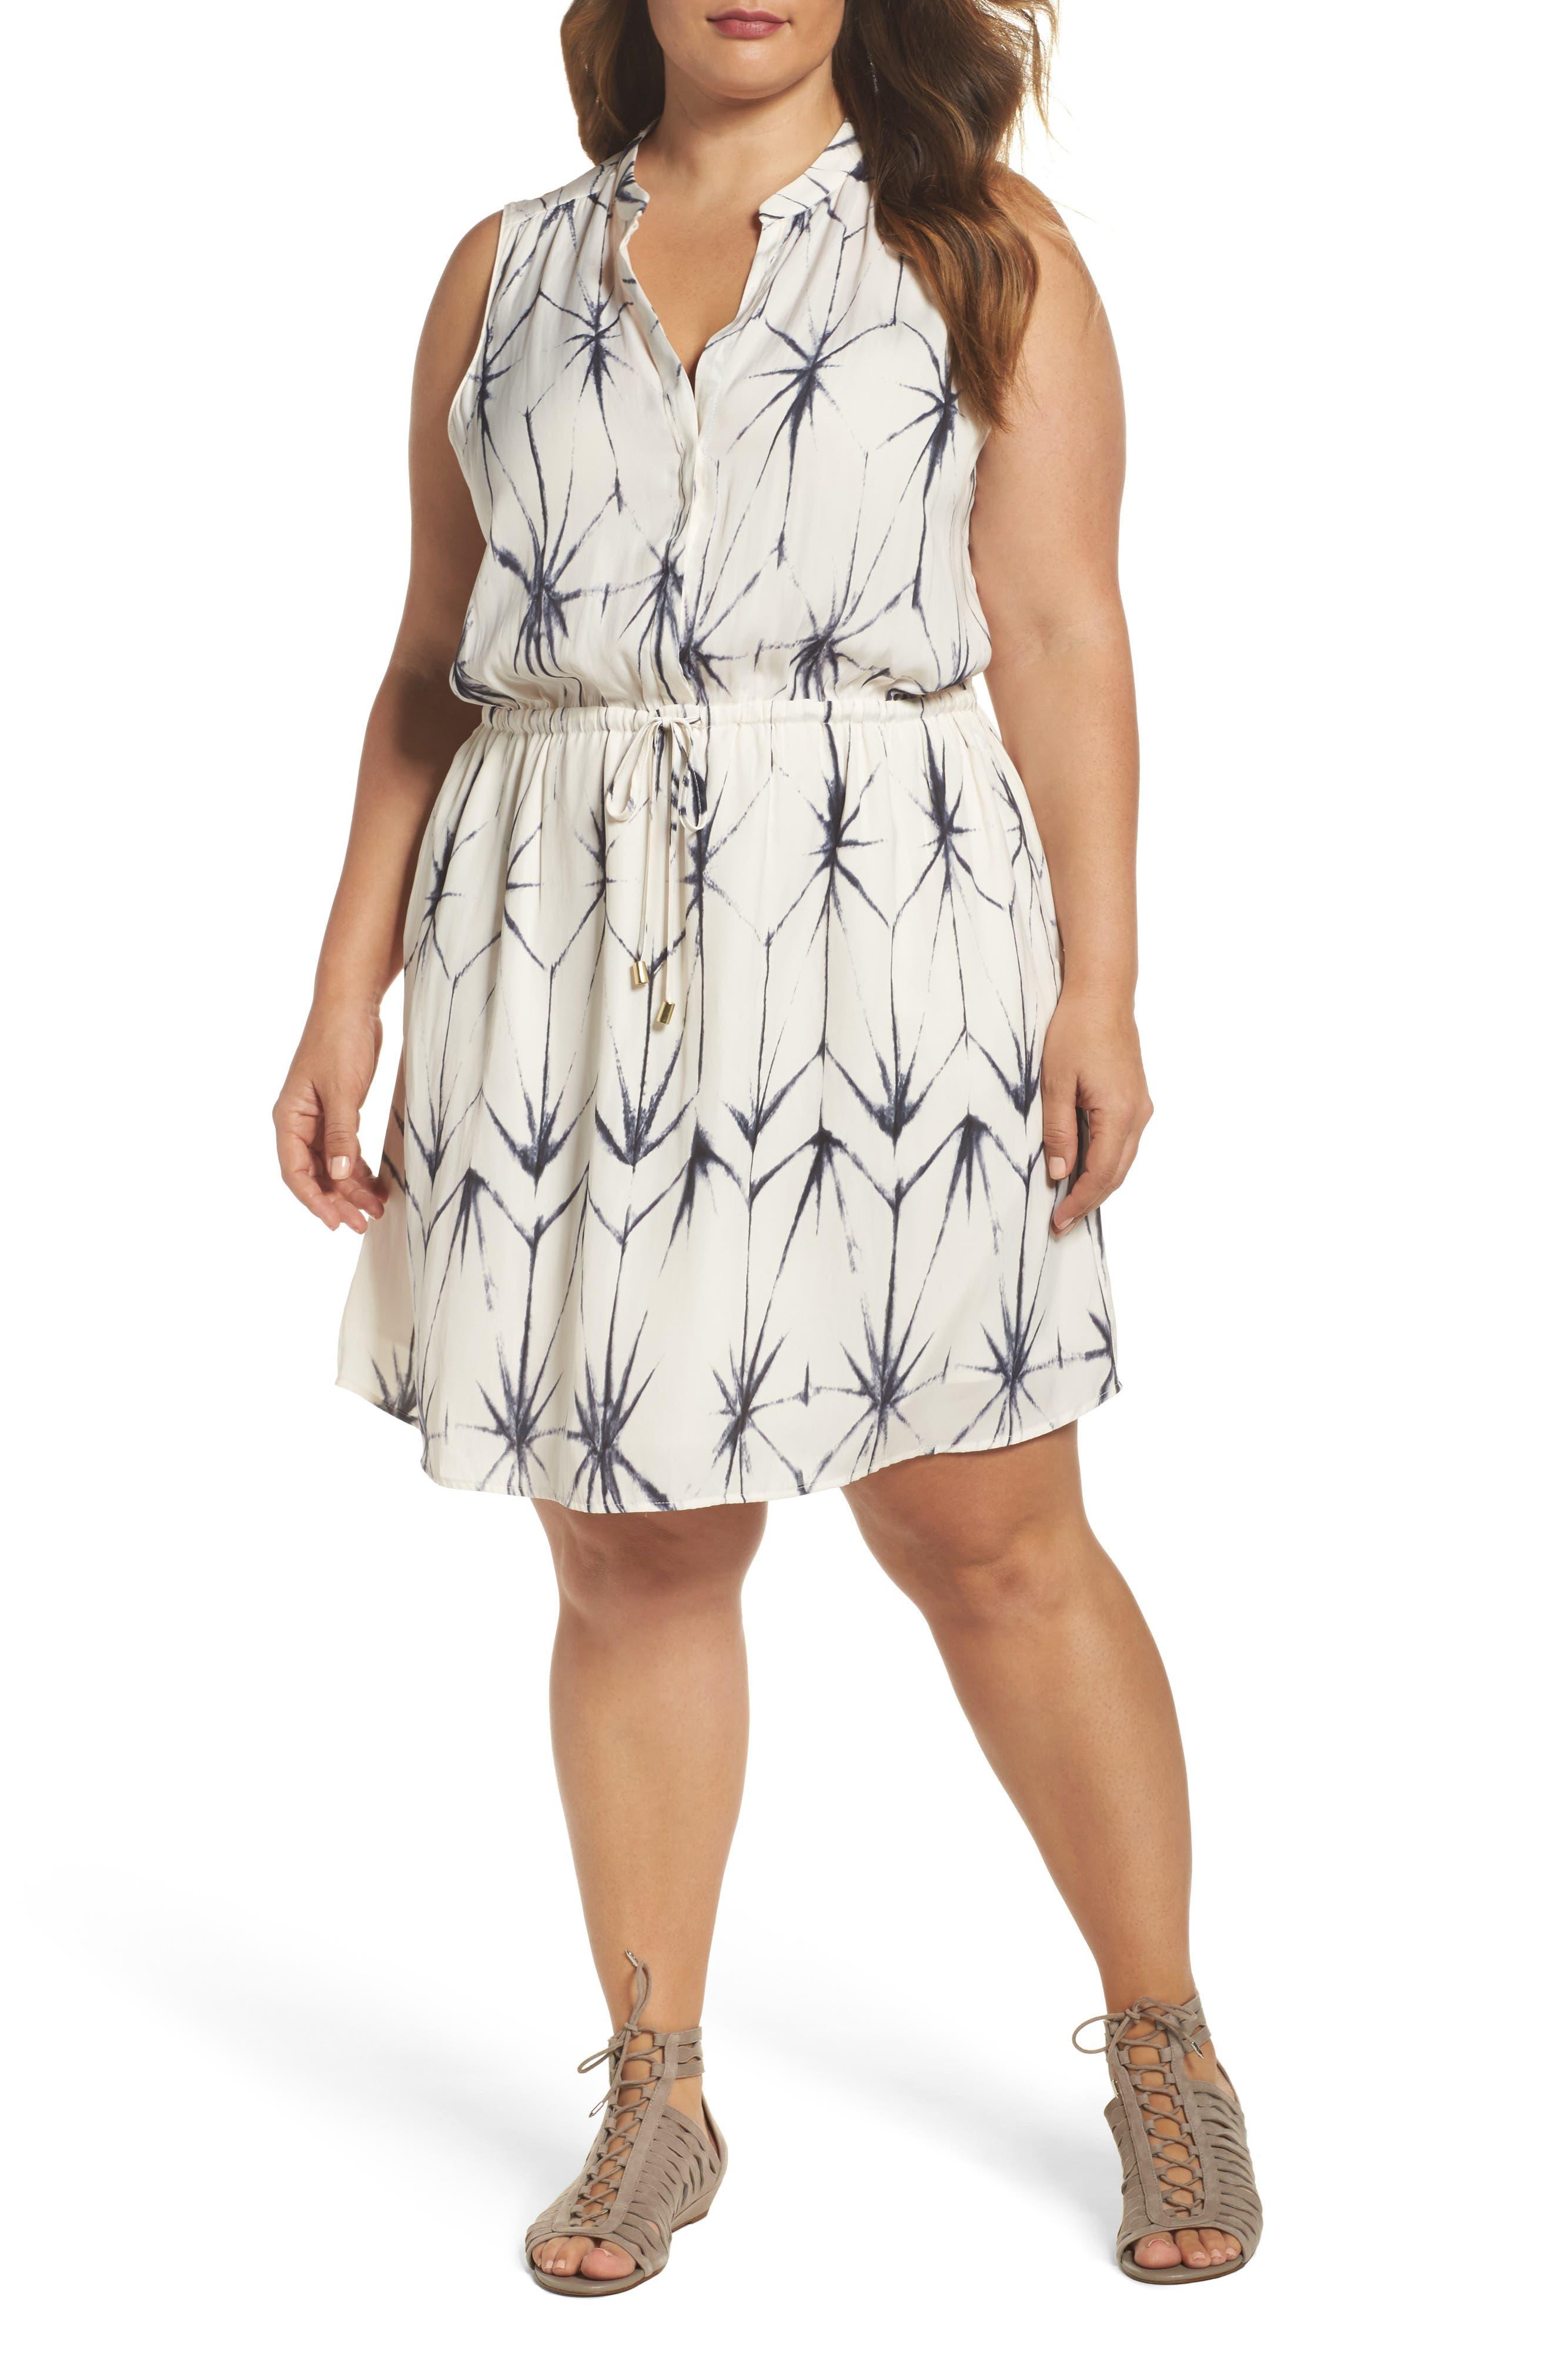 Alternate Image 1 Selected - Tart Calla Blouson Dress (Plus Size)